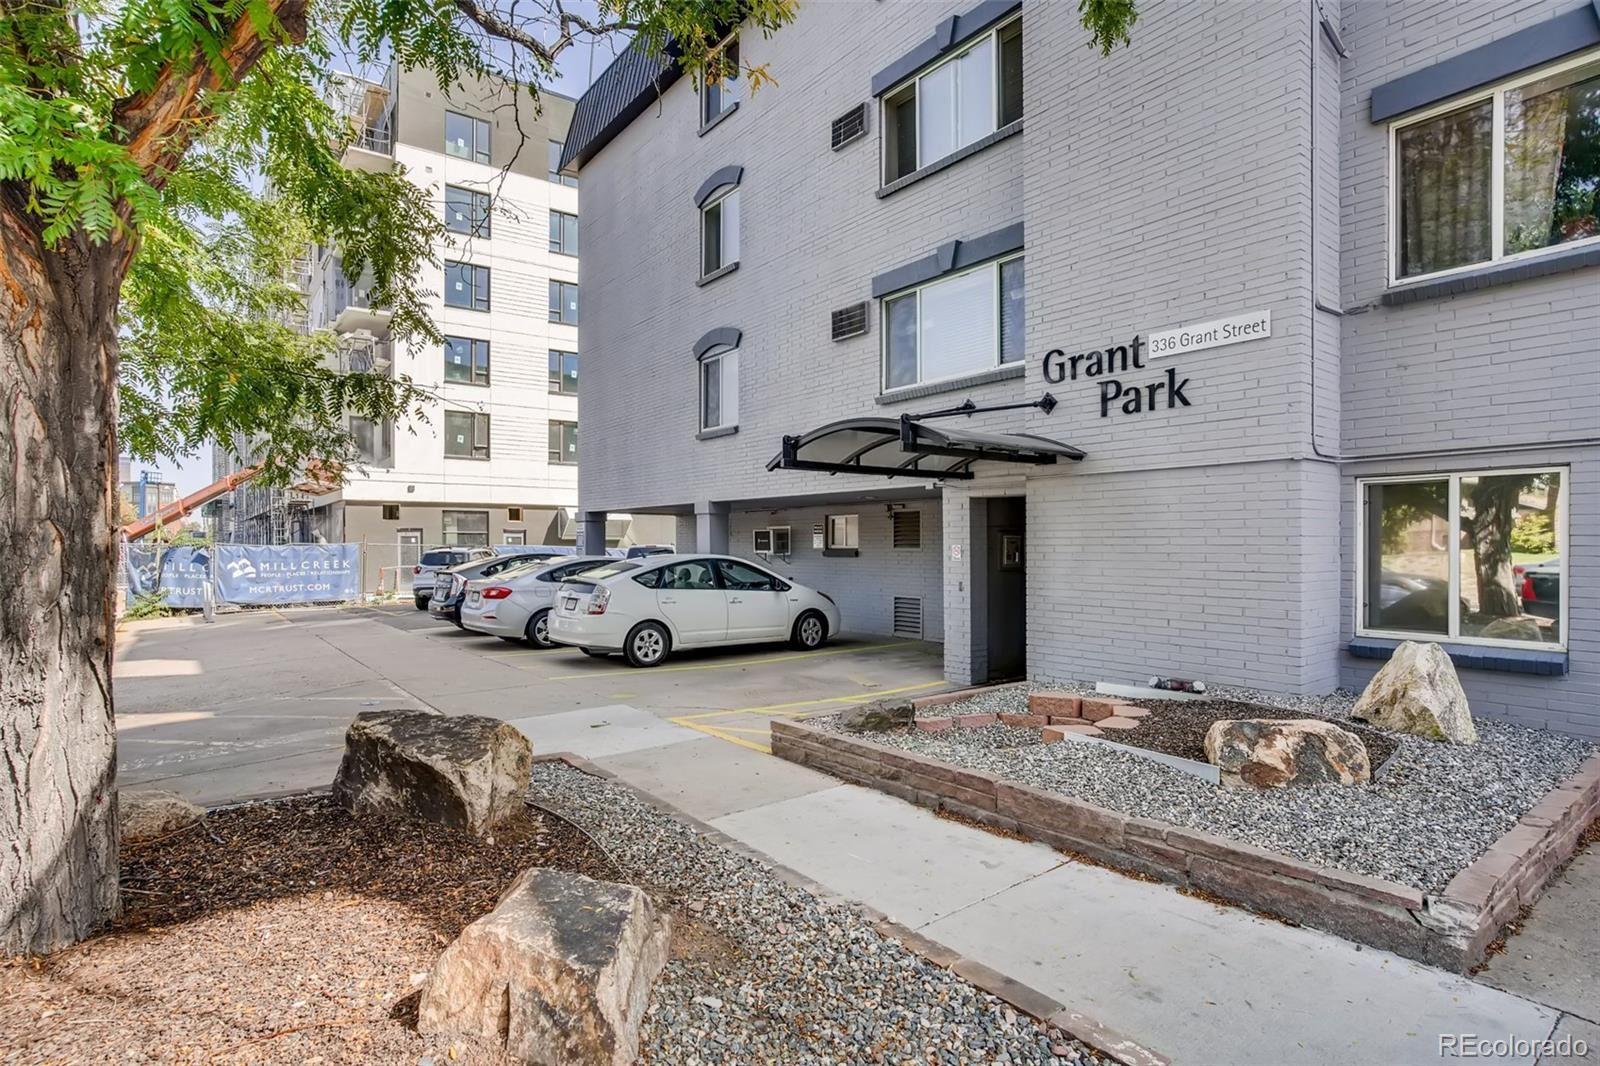 Photo of 336 N Grant Street #209, Denver, CO 80203 (MLS # 2832905)